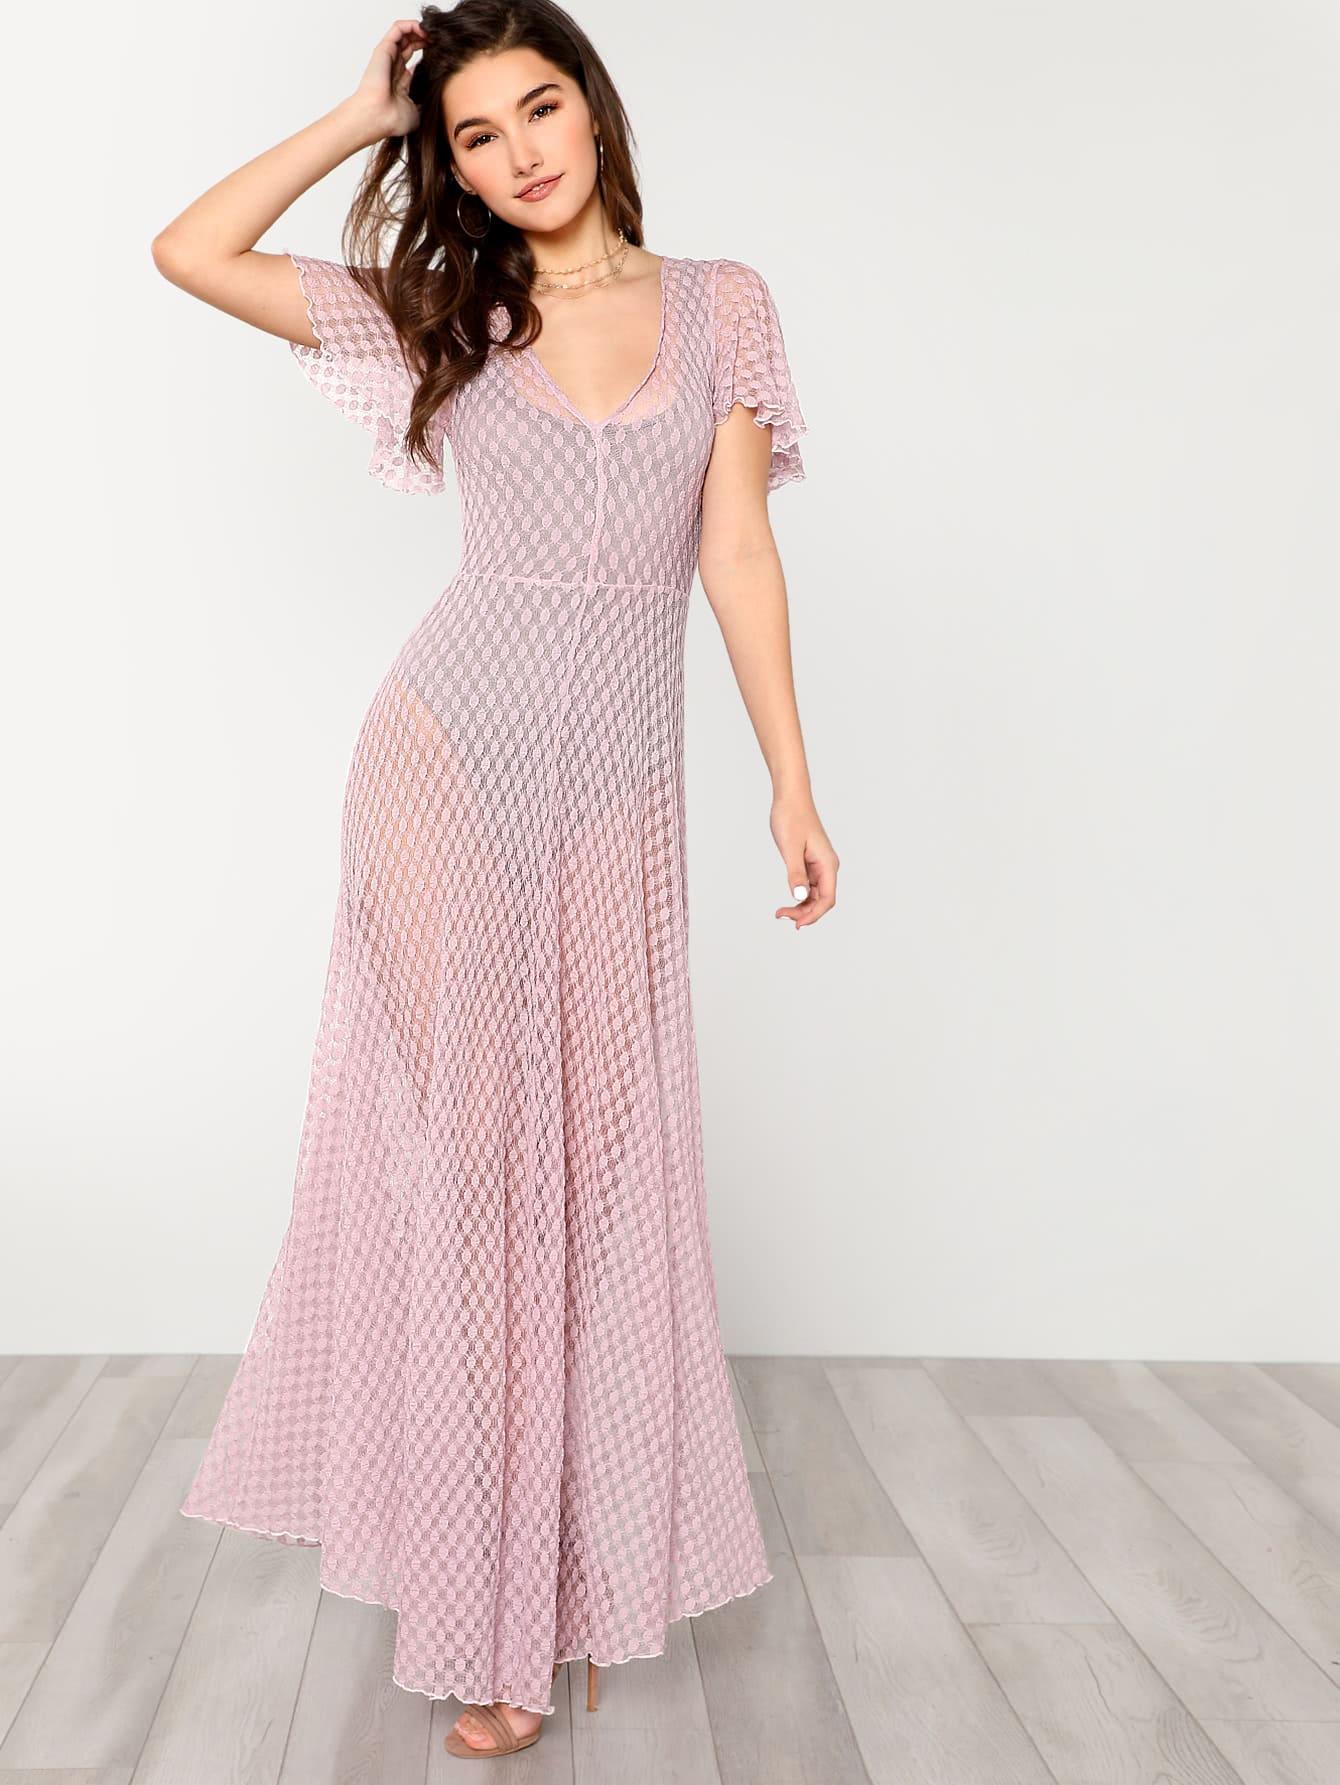 Deep V Neck Transparent Lace Dress lace up deep v neck dress